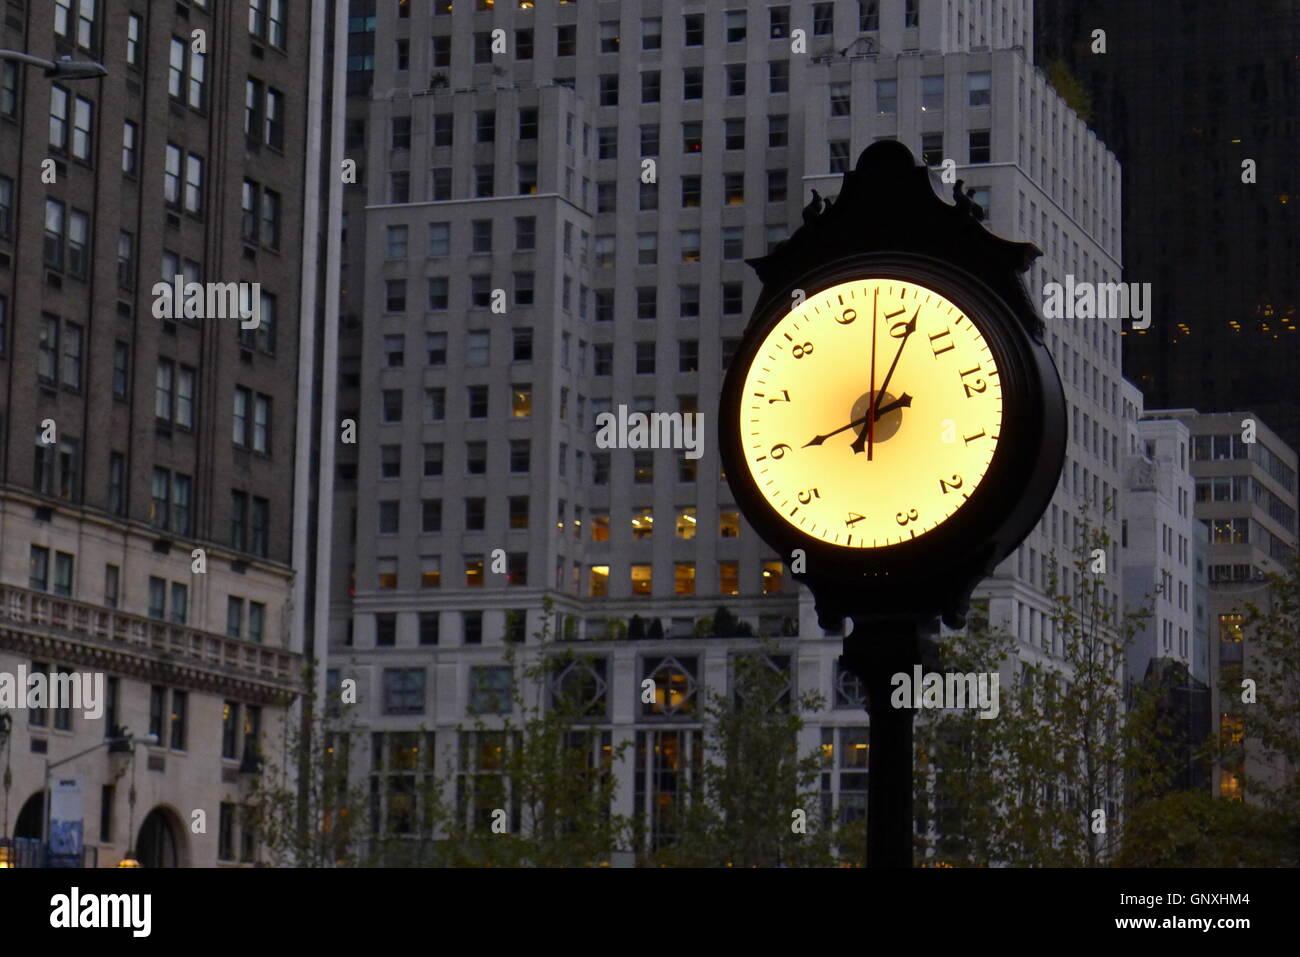 Rotating Face Clock at New York Central Park - Stock Image